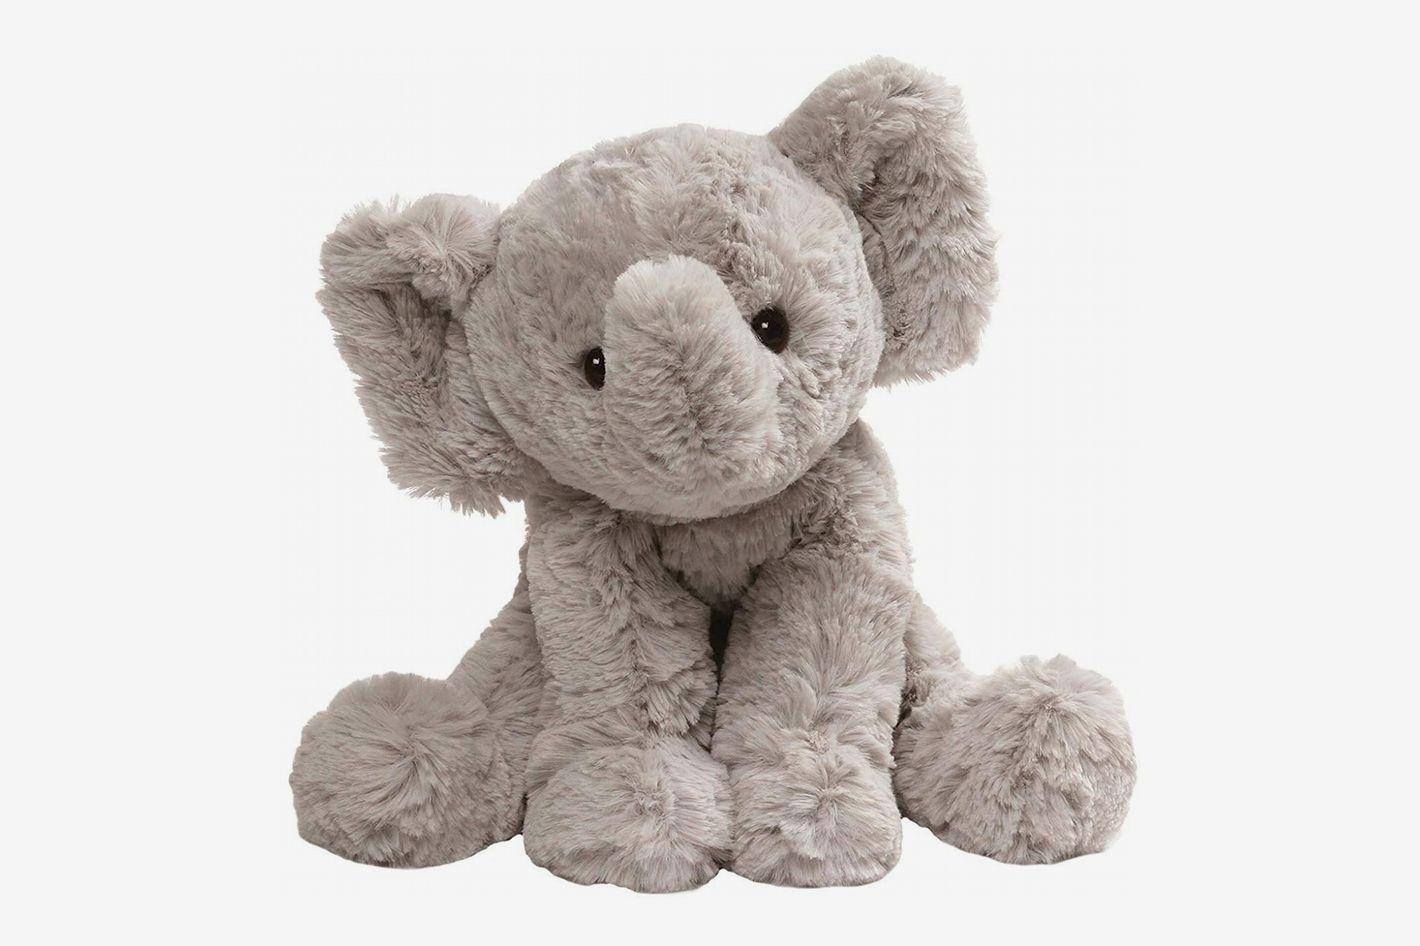 GUND Cozys Collection Elephant Stuffed Animal Plush